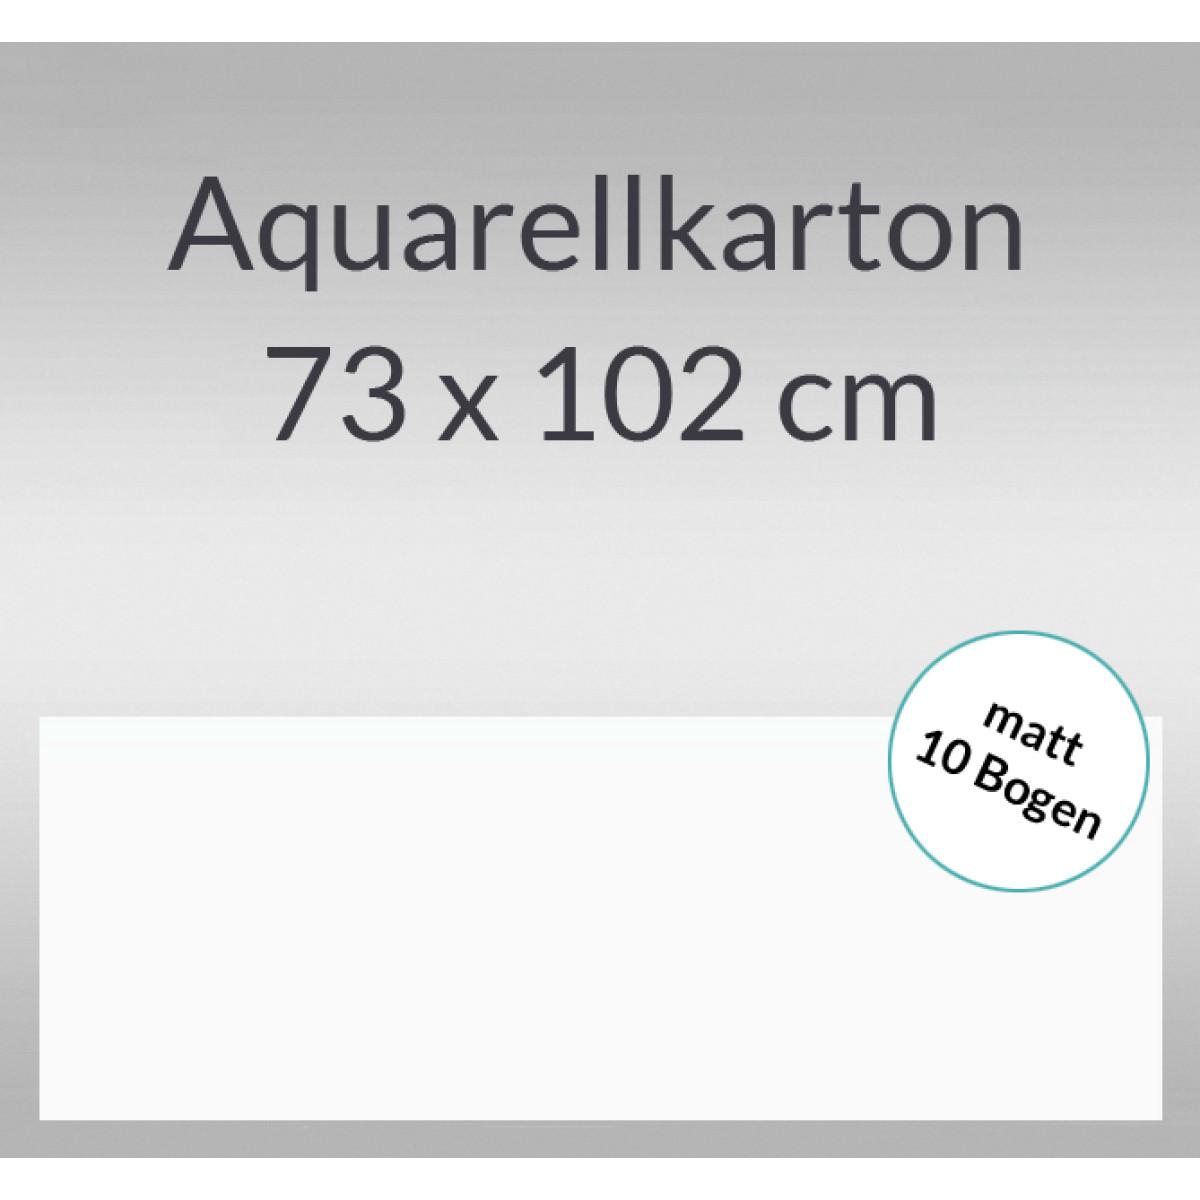 Aquarellkarton matt 200 g/qm 73 x 102 cm